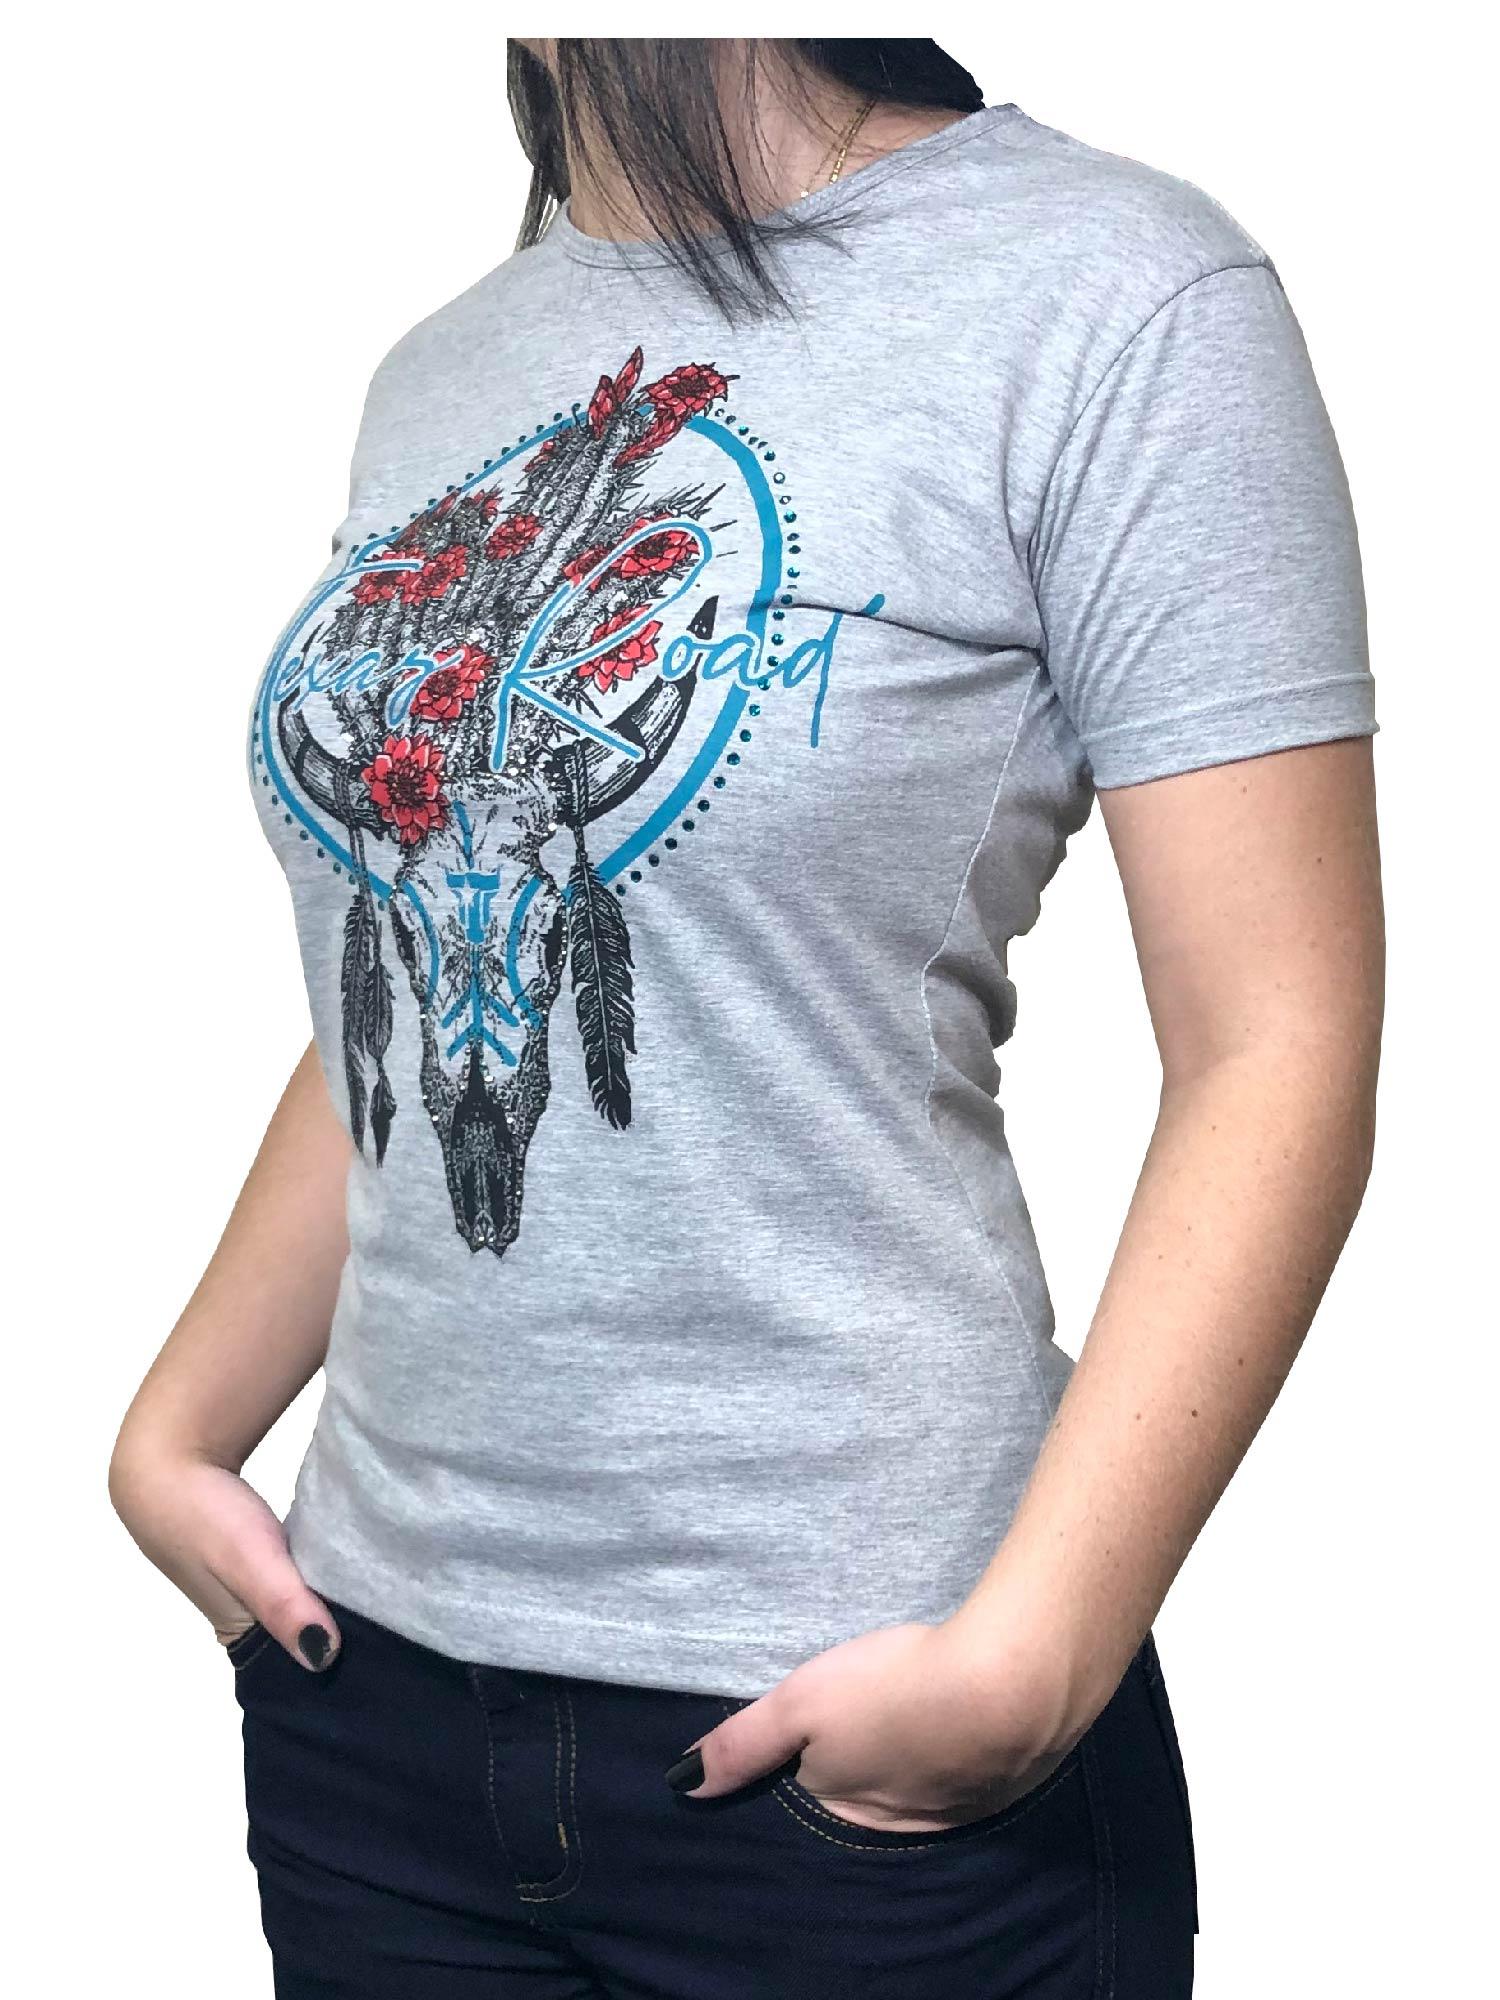 T-Shirt Feminina Texas Road C/ Brilhos